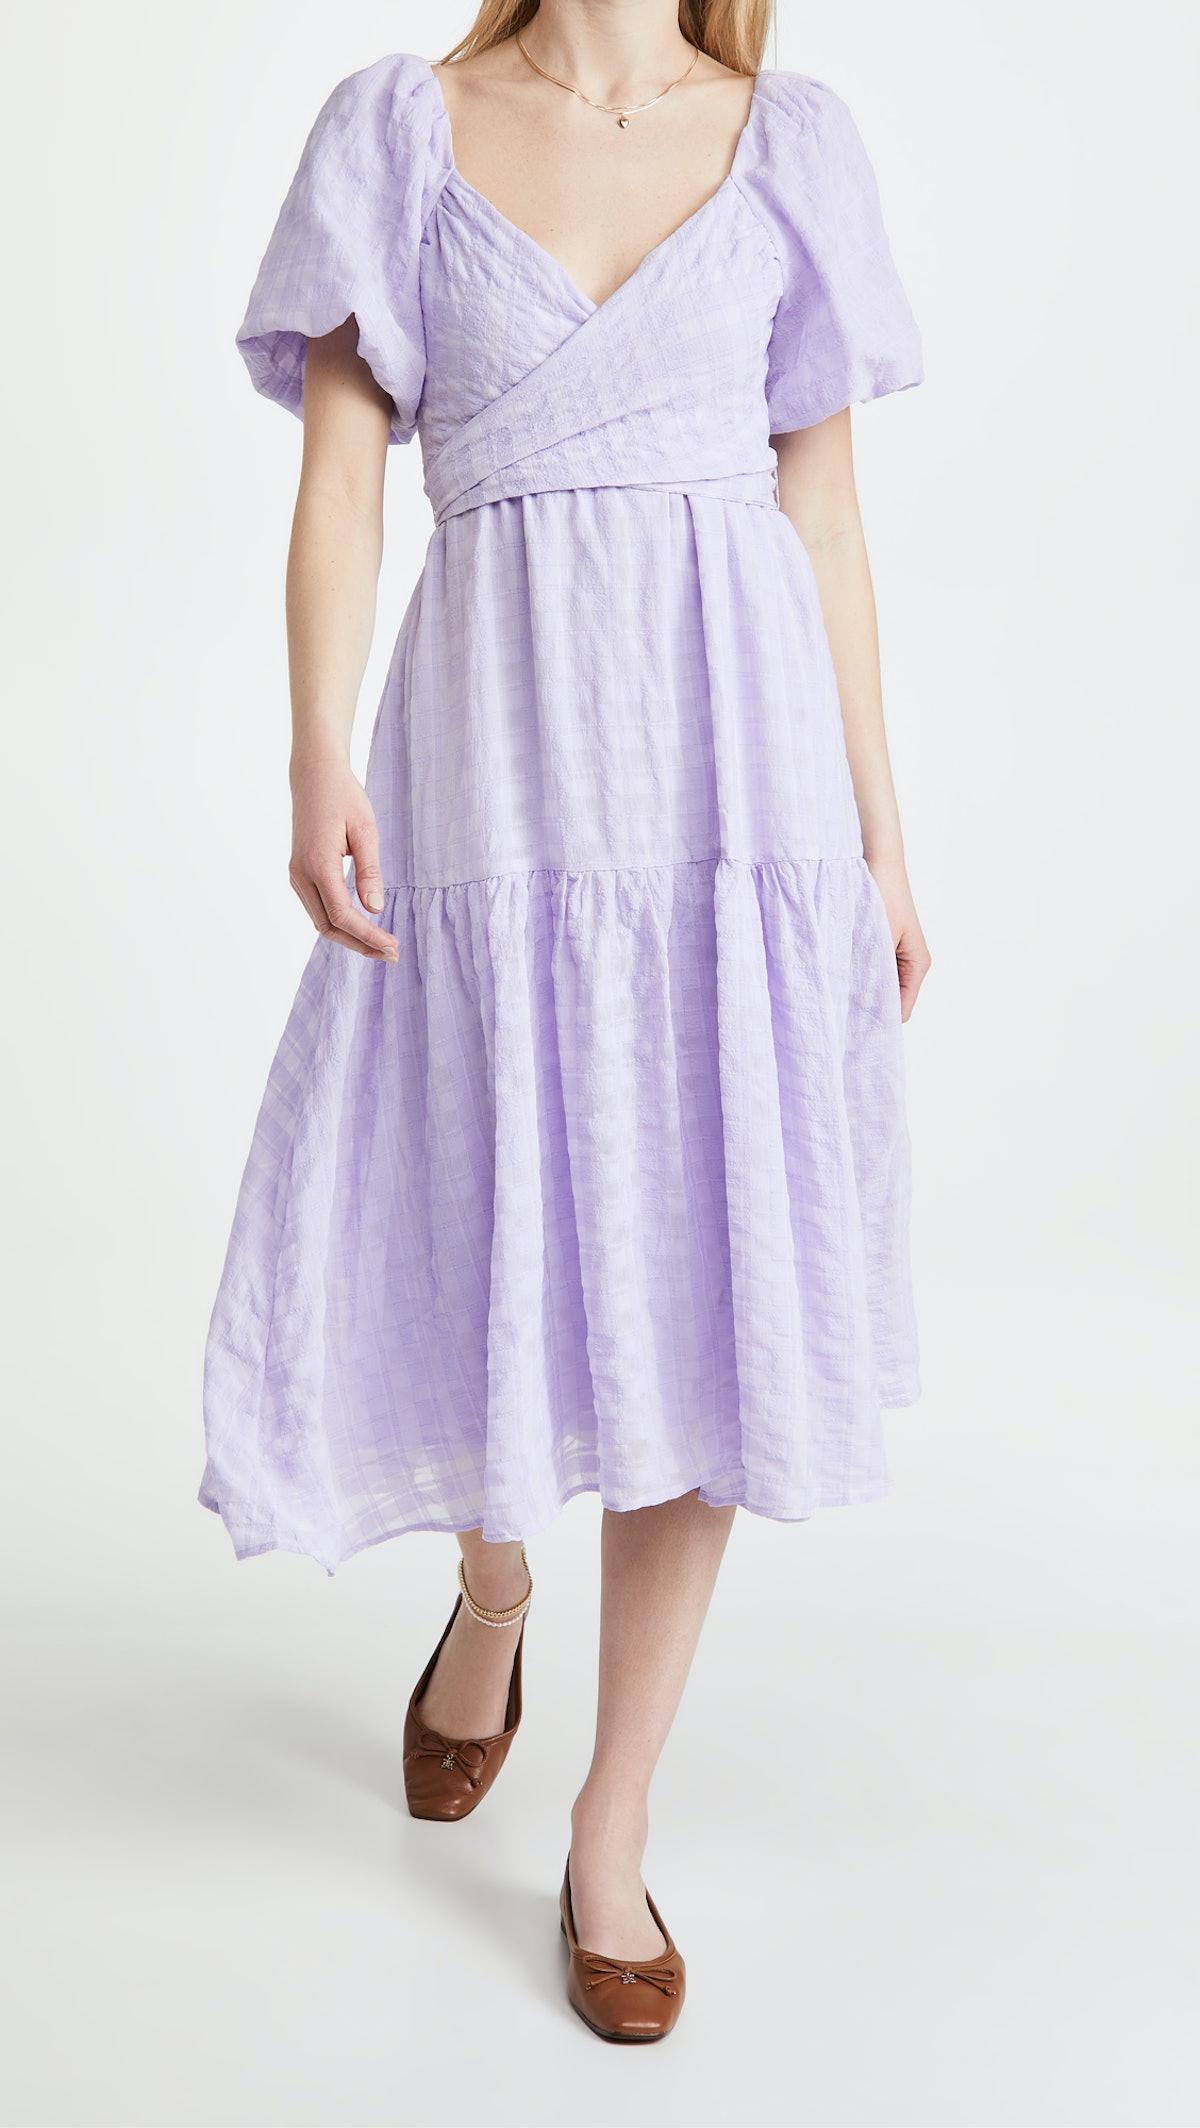 Sonnet Dress